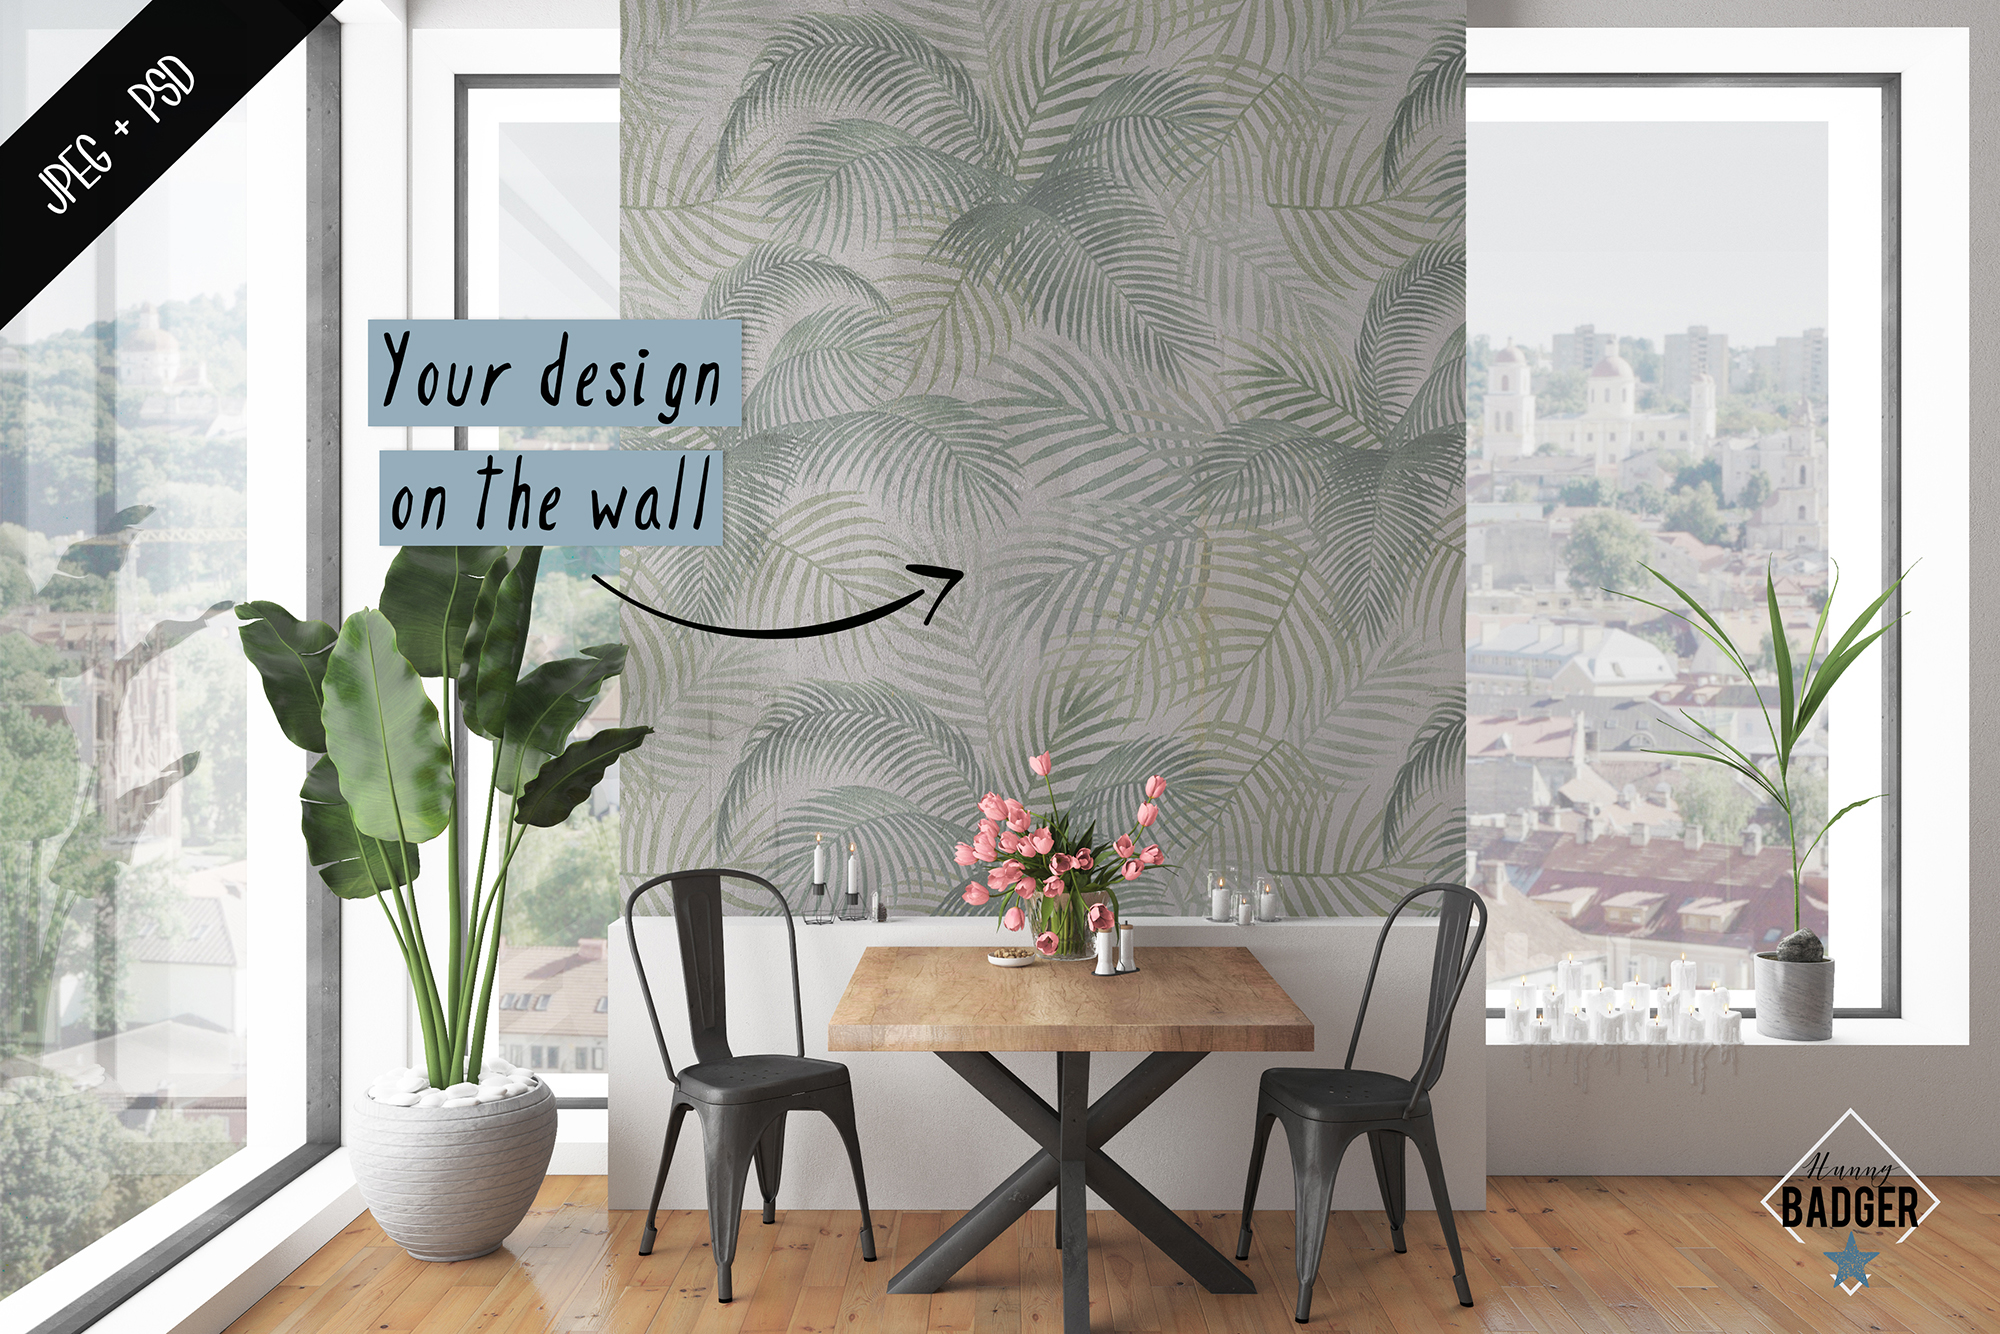 Interior mockup - frame & wall mockup creator example image 5